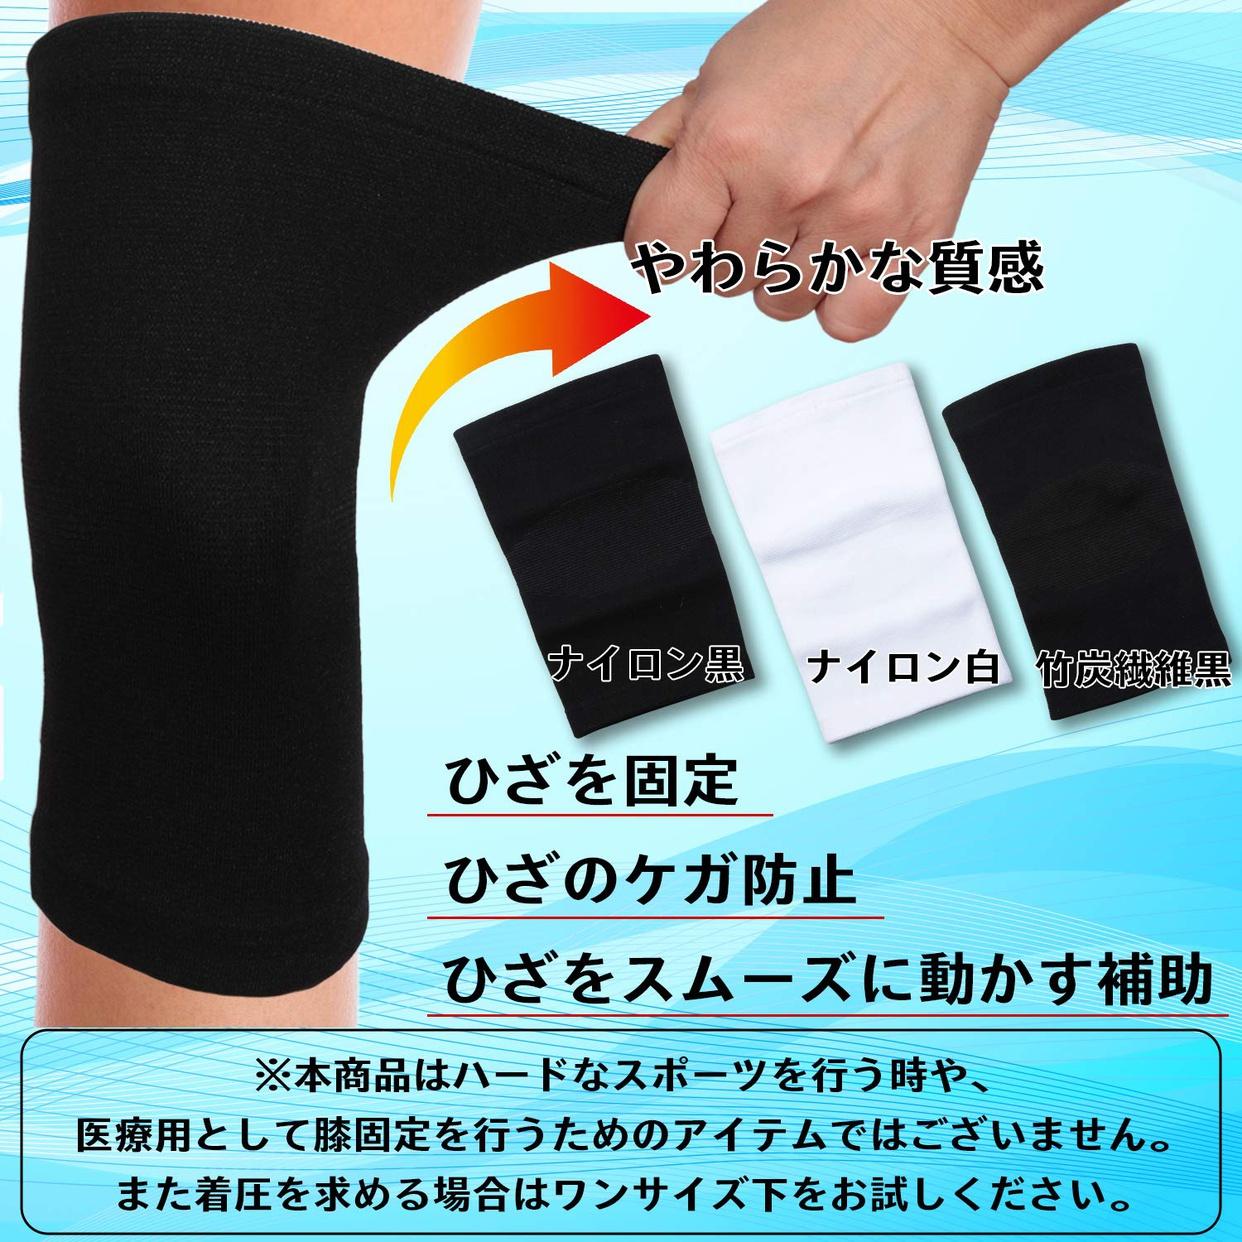 TOMOZONE(トモゾーン) 膝サポーター 両ヒザ用の商品画像3